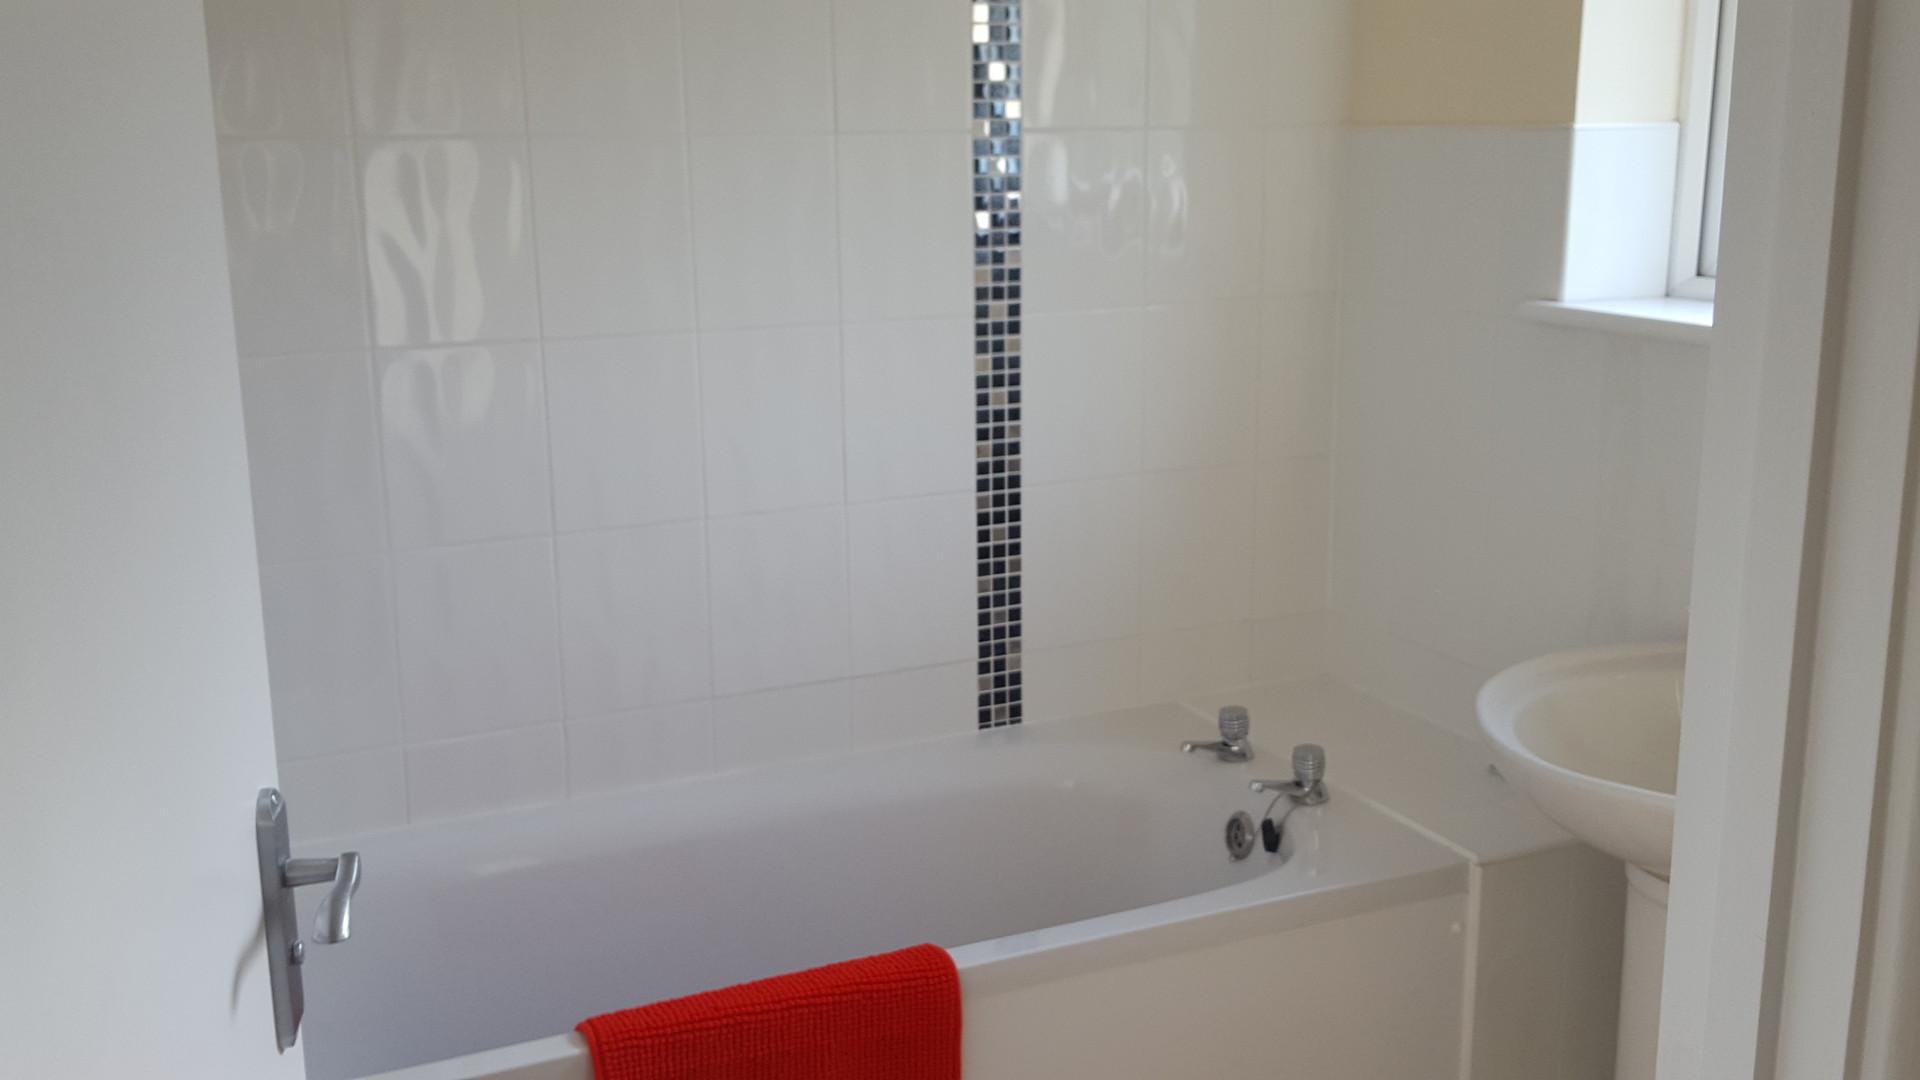 double-room-lovely-refurbished-house-share-redditch-823463c5fd41b0c32f864606f3d2e3d2.jpg